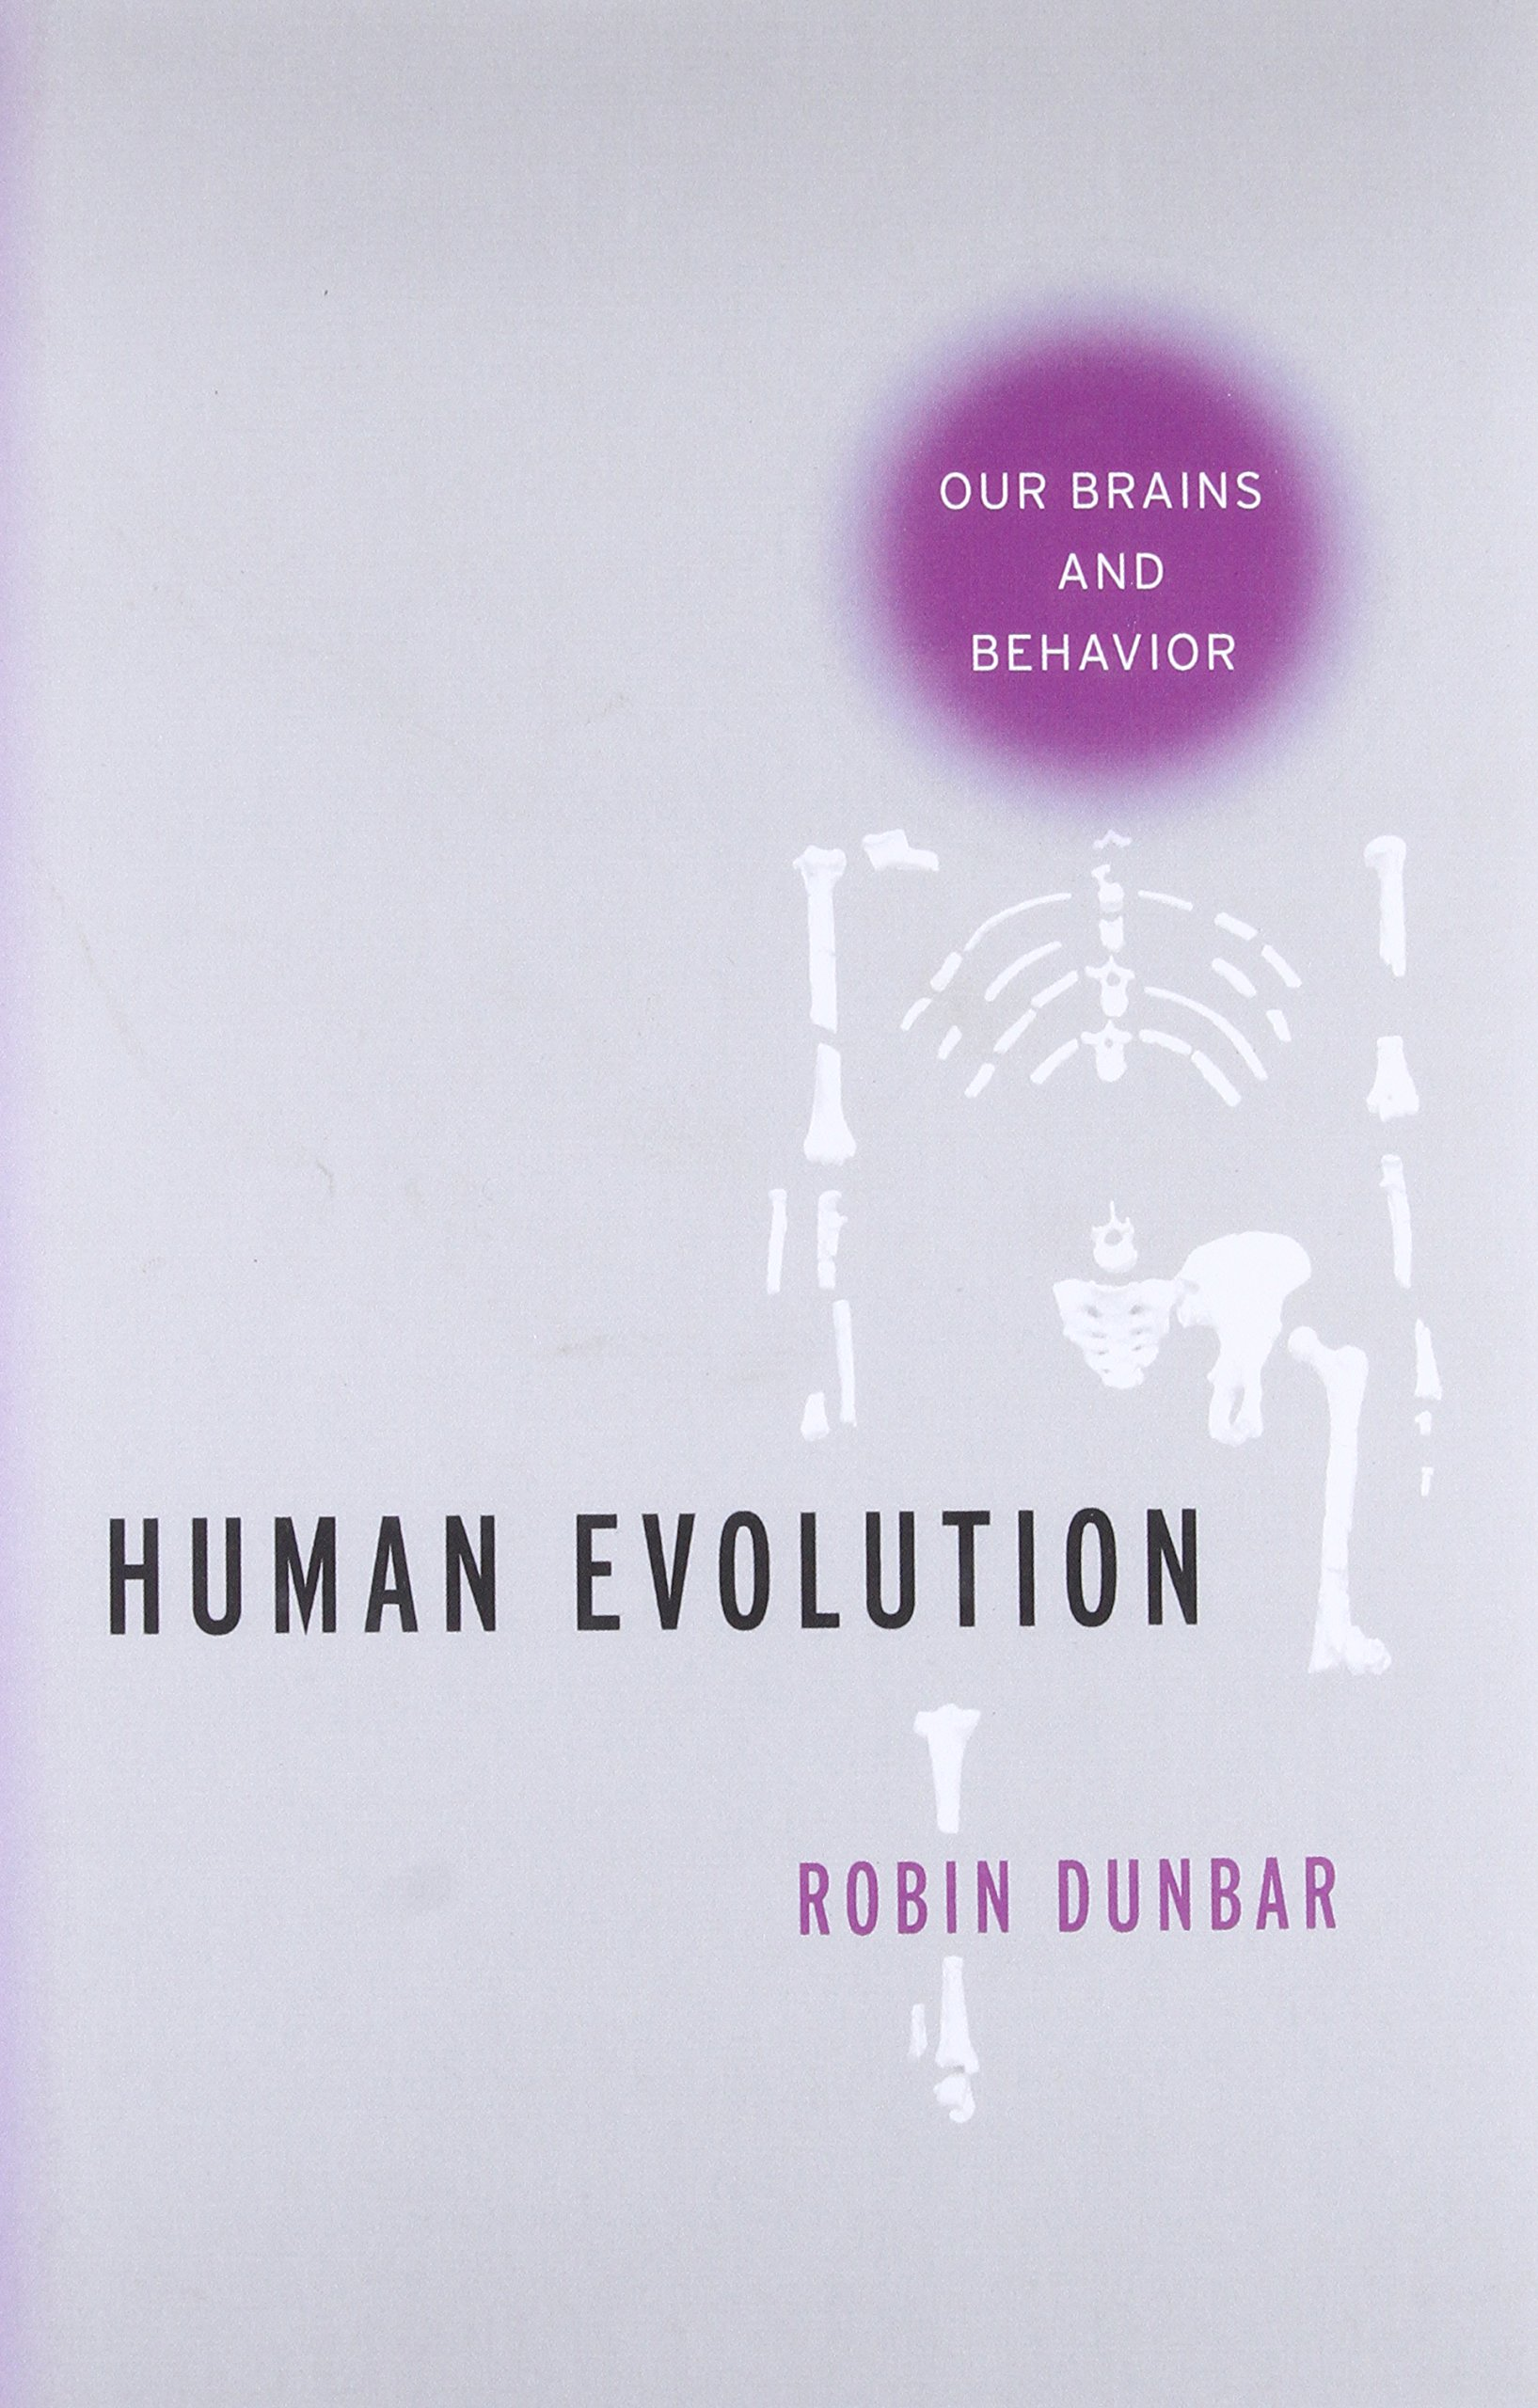 amazon human evolution our brains and behavior robin dunbar